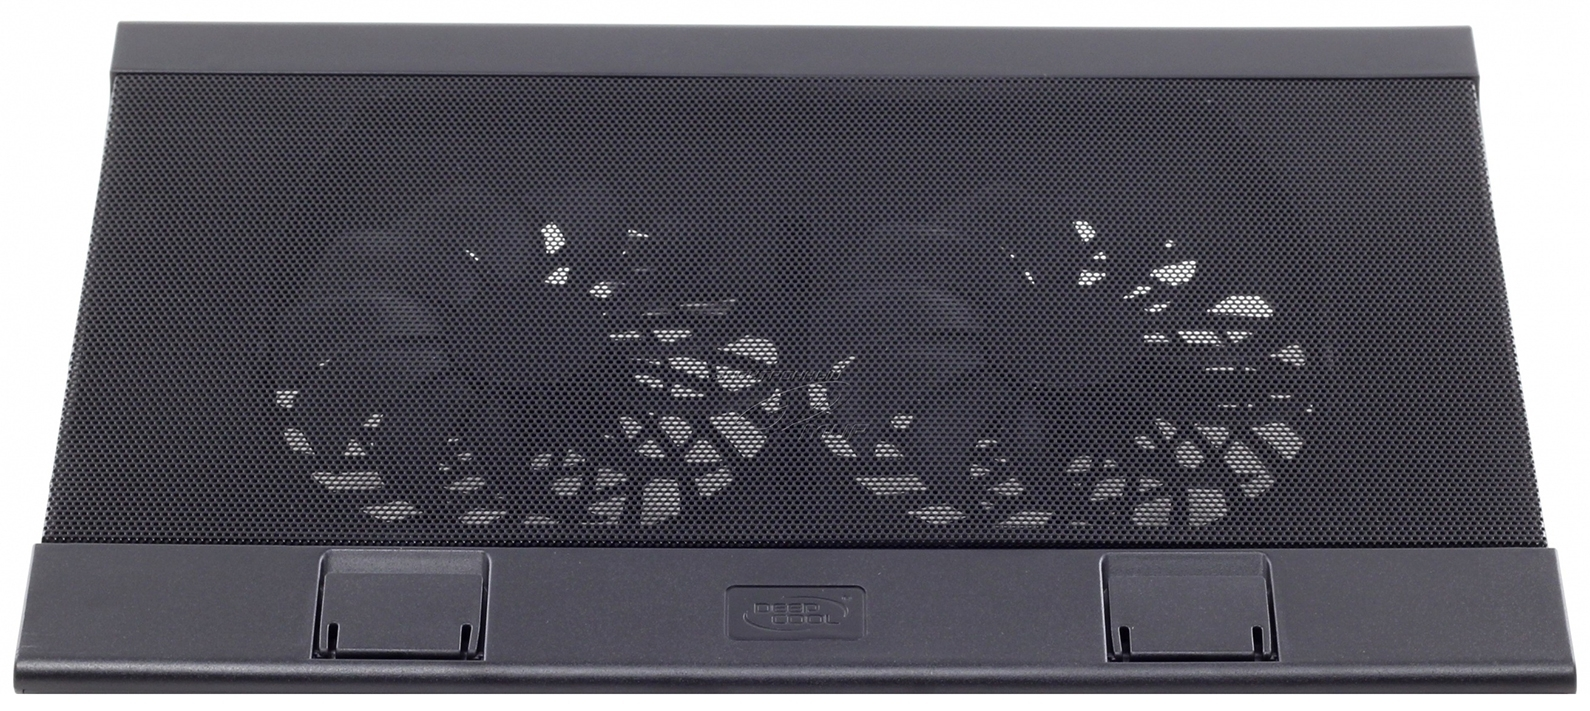 Подставка для ноутбука Deepcool Wind Pal FS 17 , Black - Подставки для ноутбуков